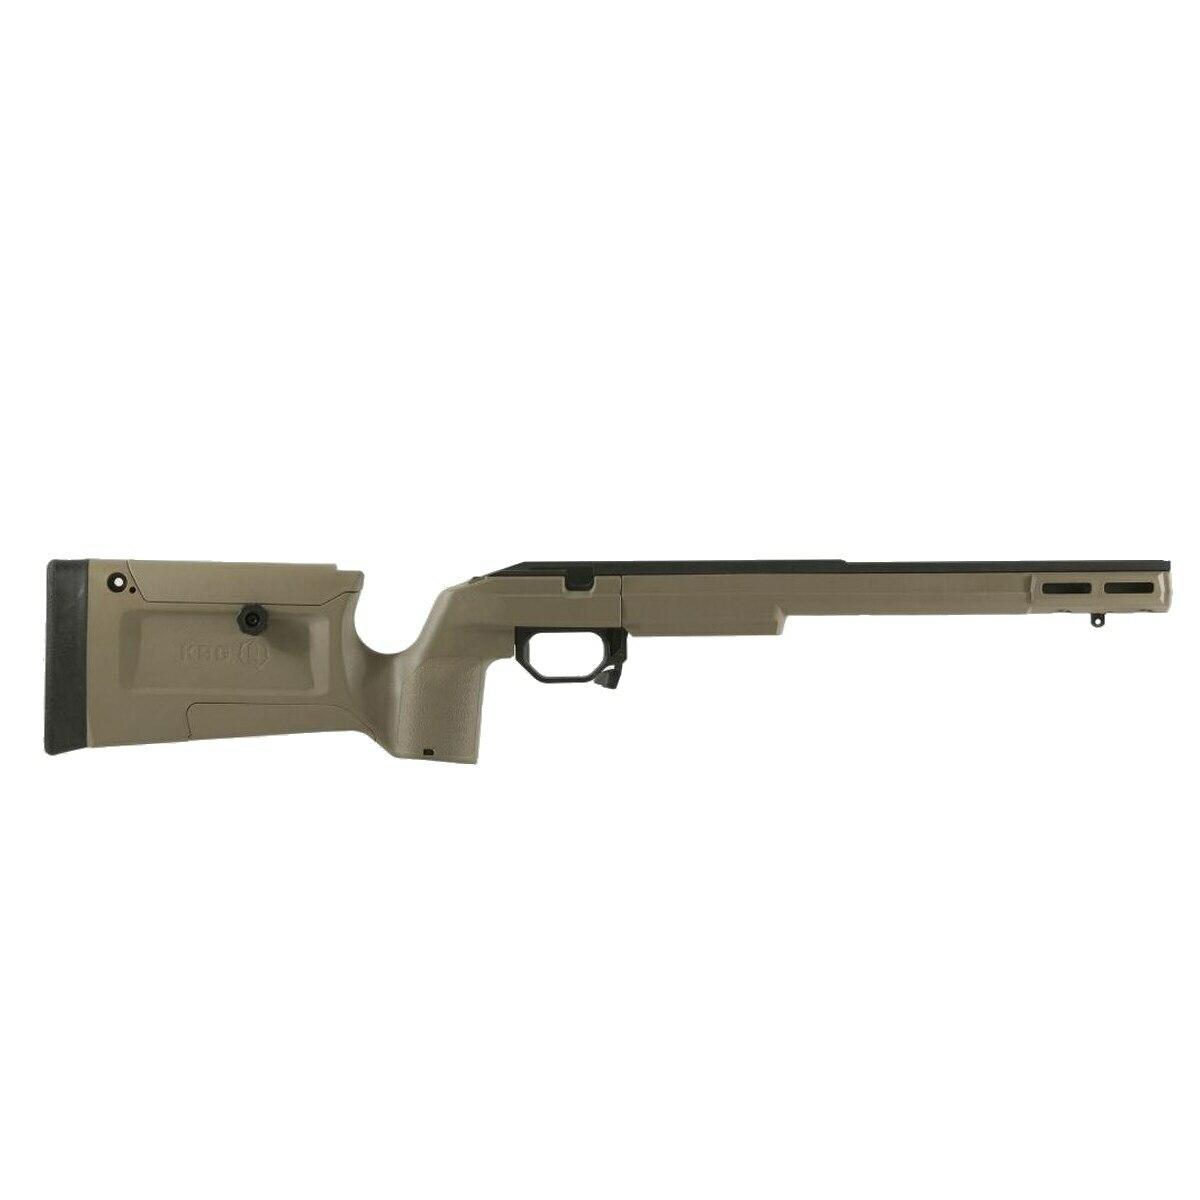 KRG Bravo Rifle Chassis Remington 700 LA FDE